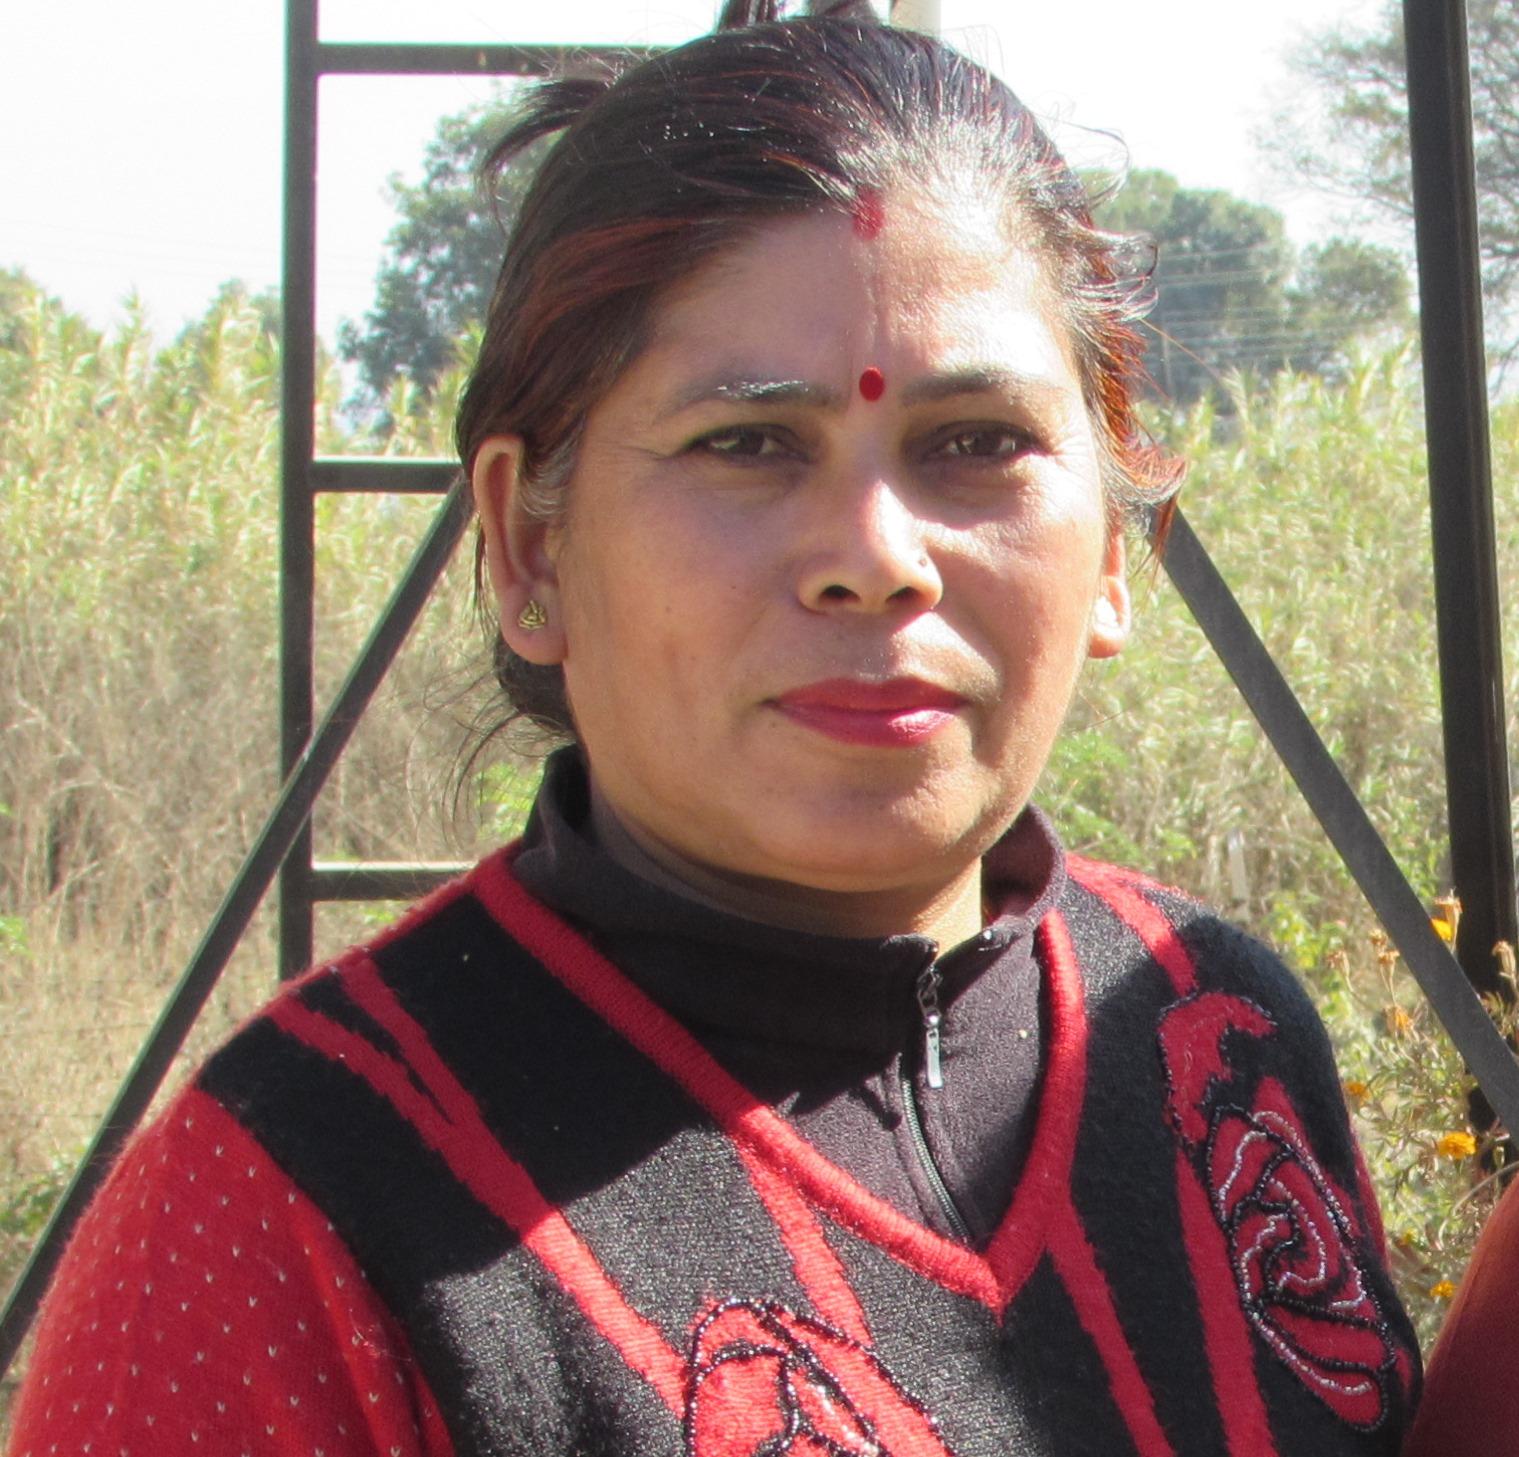 Mrs. Ishwari Adhikari Khadka